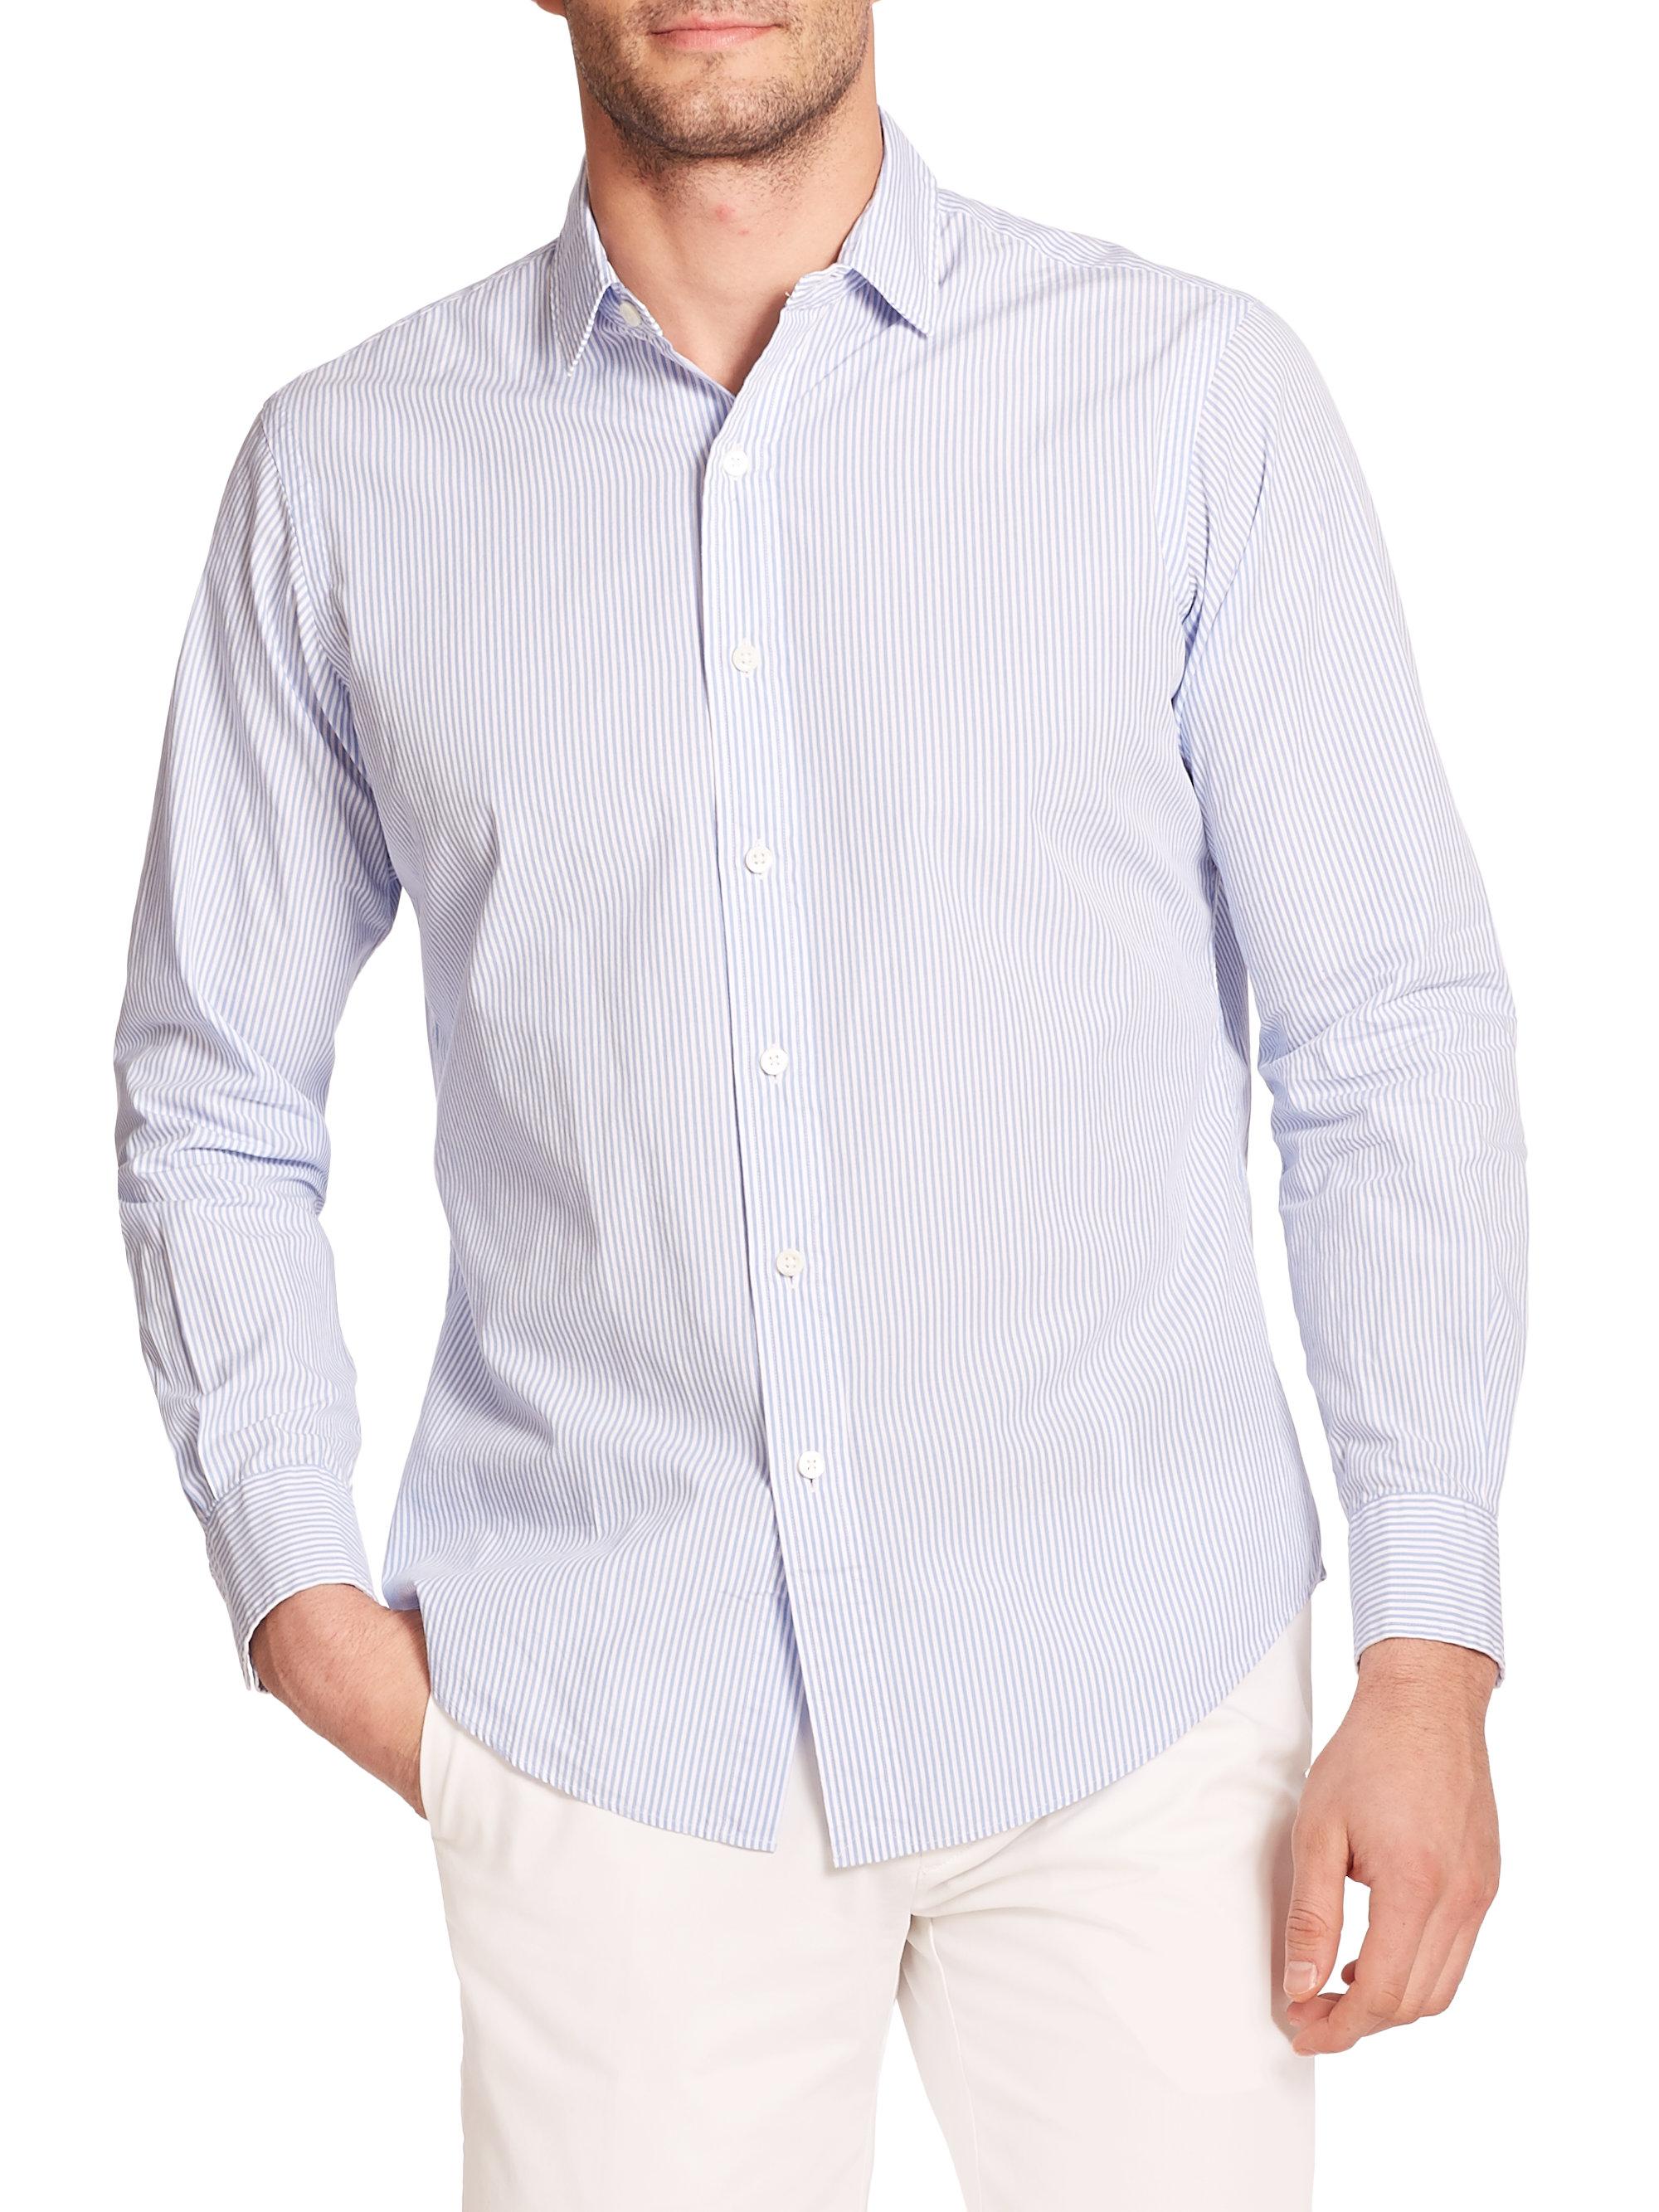 Lyst polo ralph lauren striped poplin shirt in blue for men for What is a poplin shirt